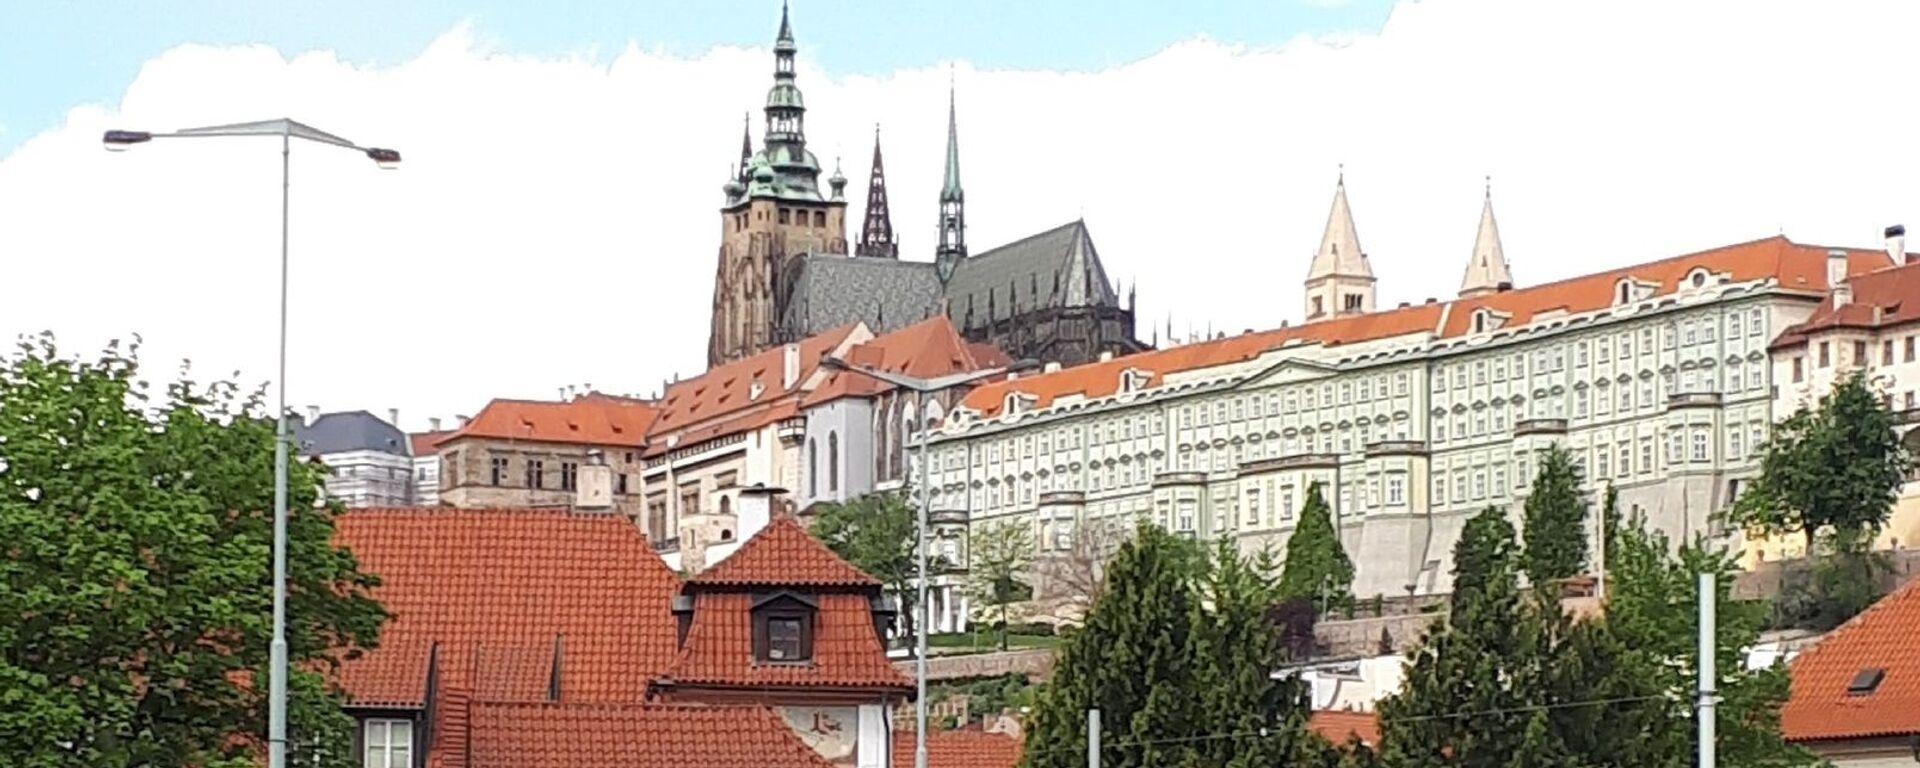 Praha v době koronaviru - Sputnik Česká republika, 1920, 04.05.2021